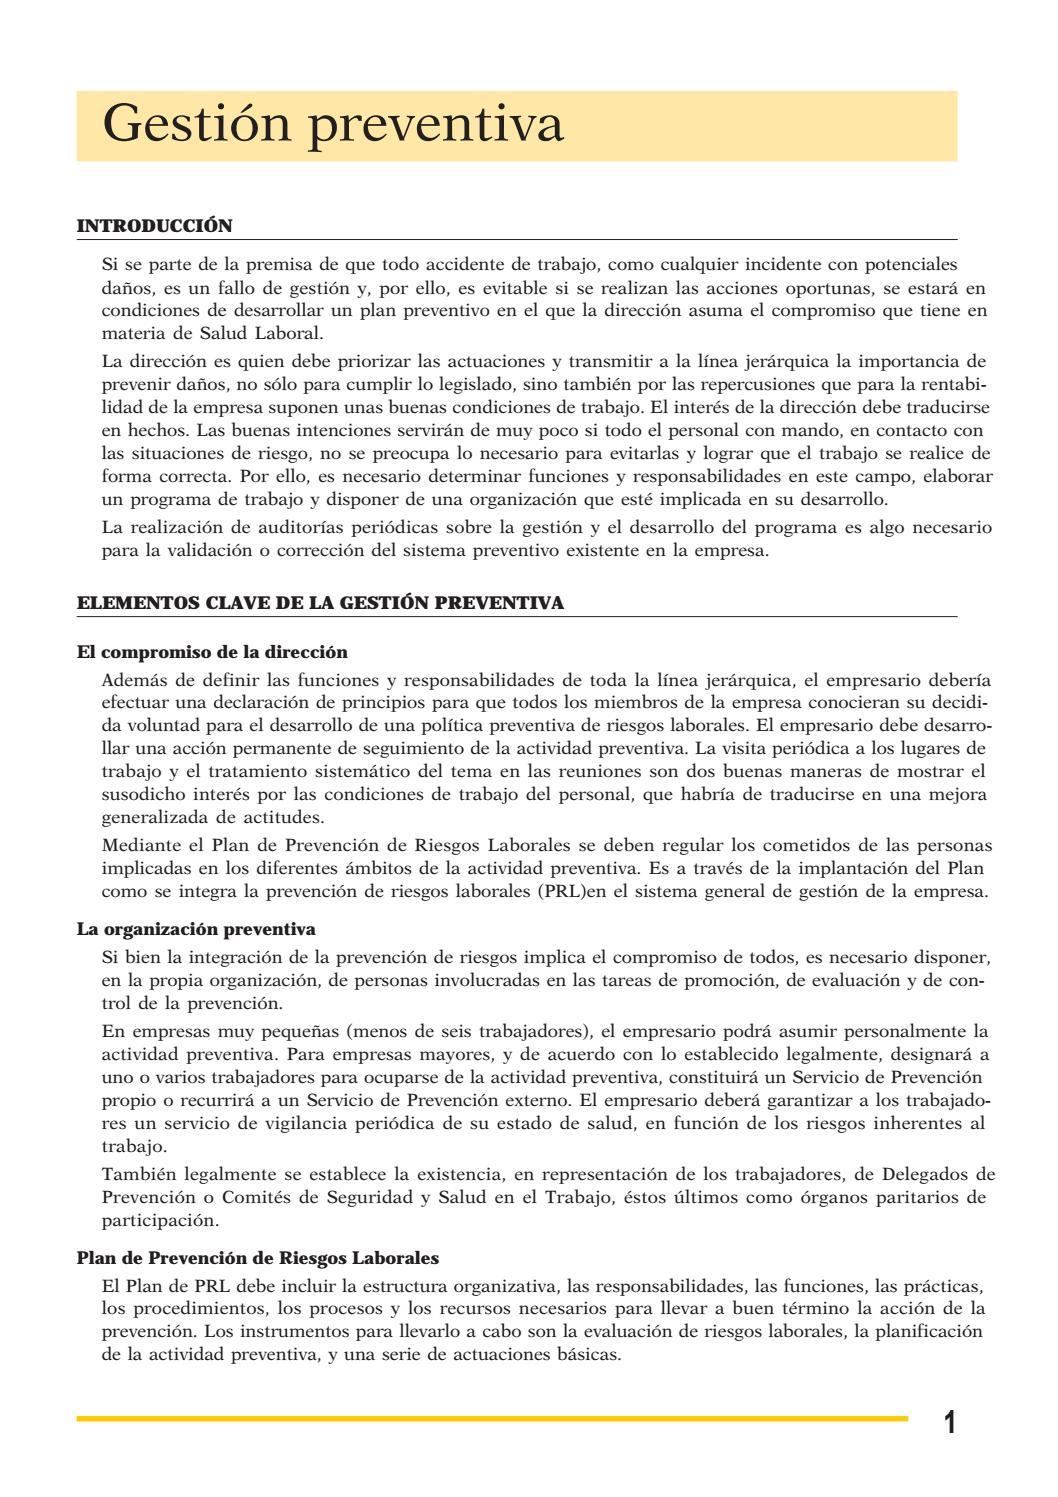 Gestion prevencion%20riesgos %5b%5d by Jose Manuel Perulero - issuu